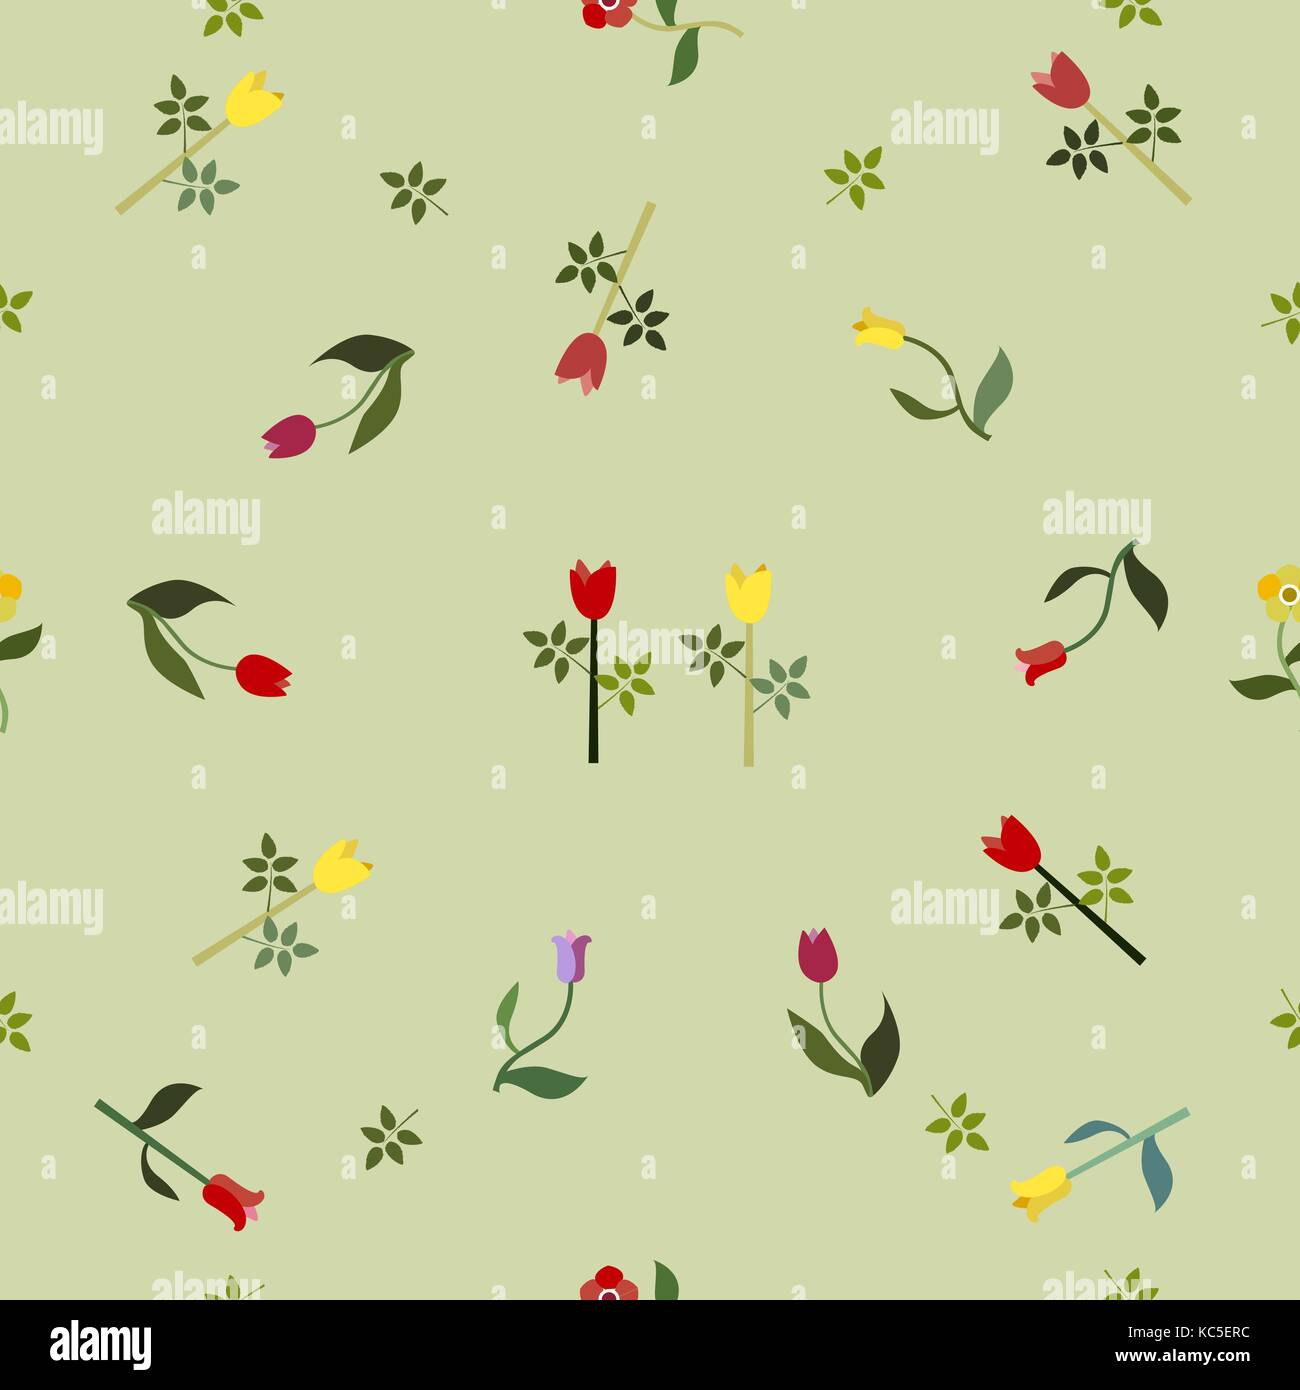 Seamless Floral Pattern. Modern Design. Vector Illustration - Stock Vector